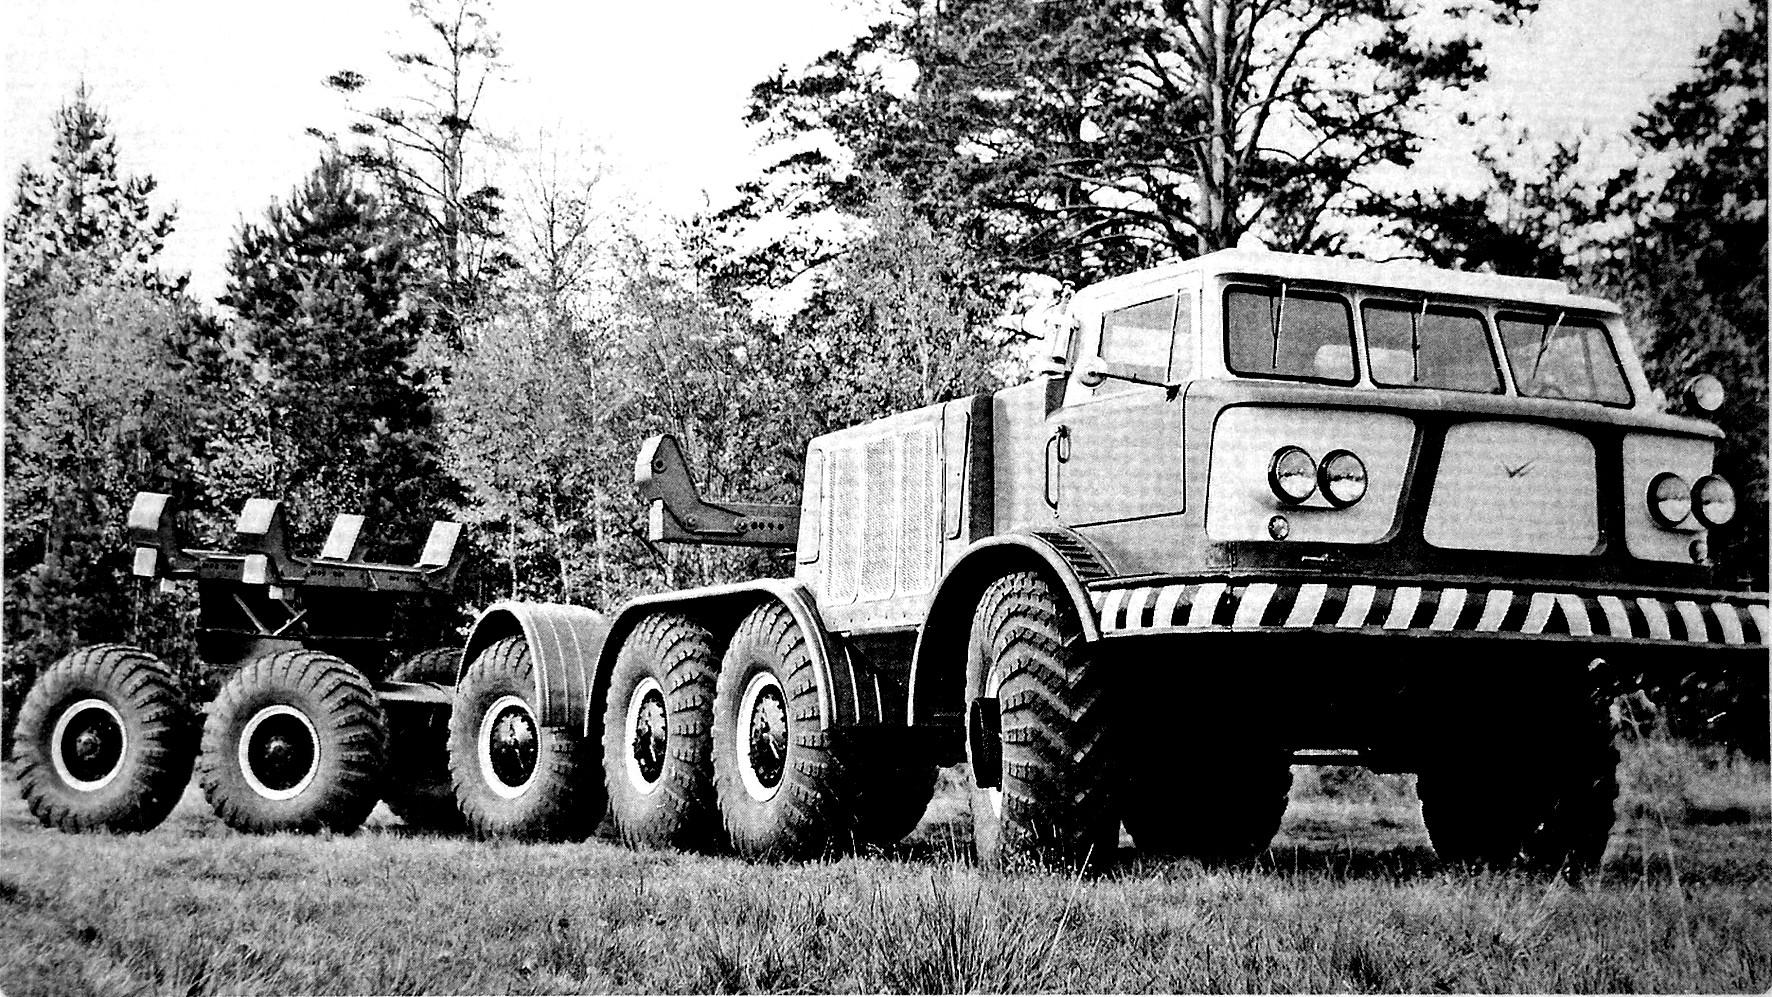 Испытания тягача ЗИЛ-135ЛБ с роспуском для перевозки труб. 1965 год